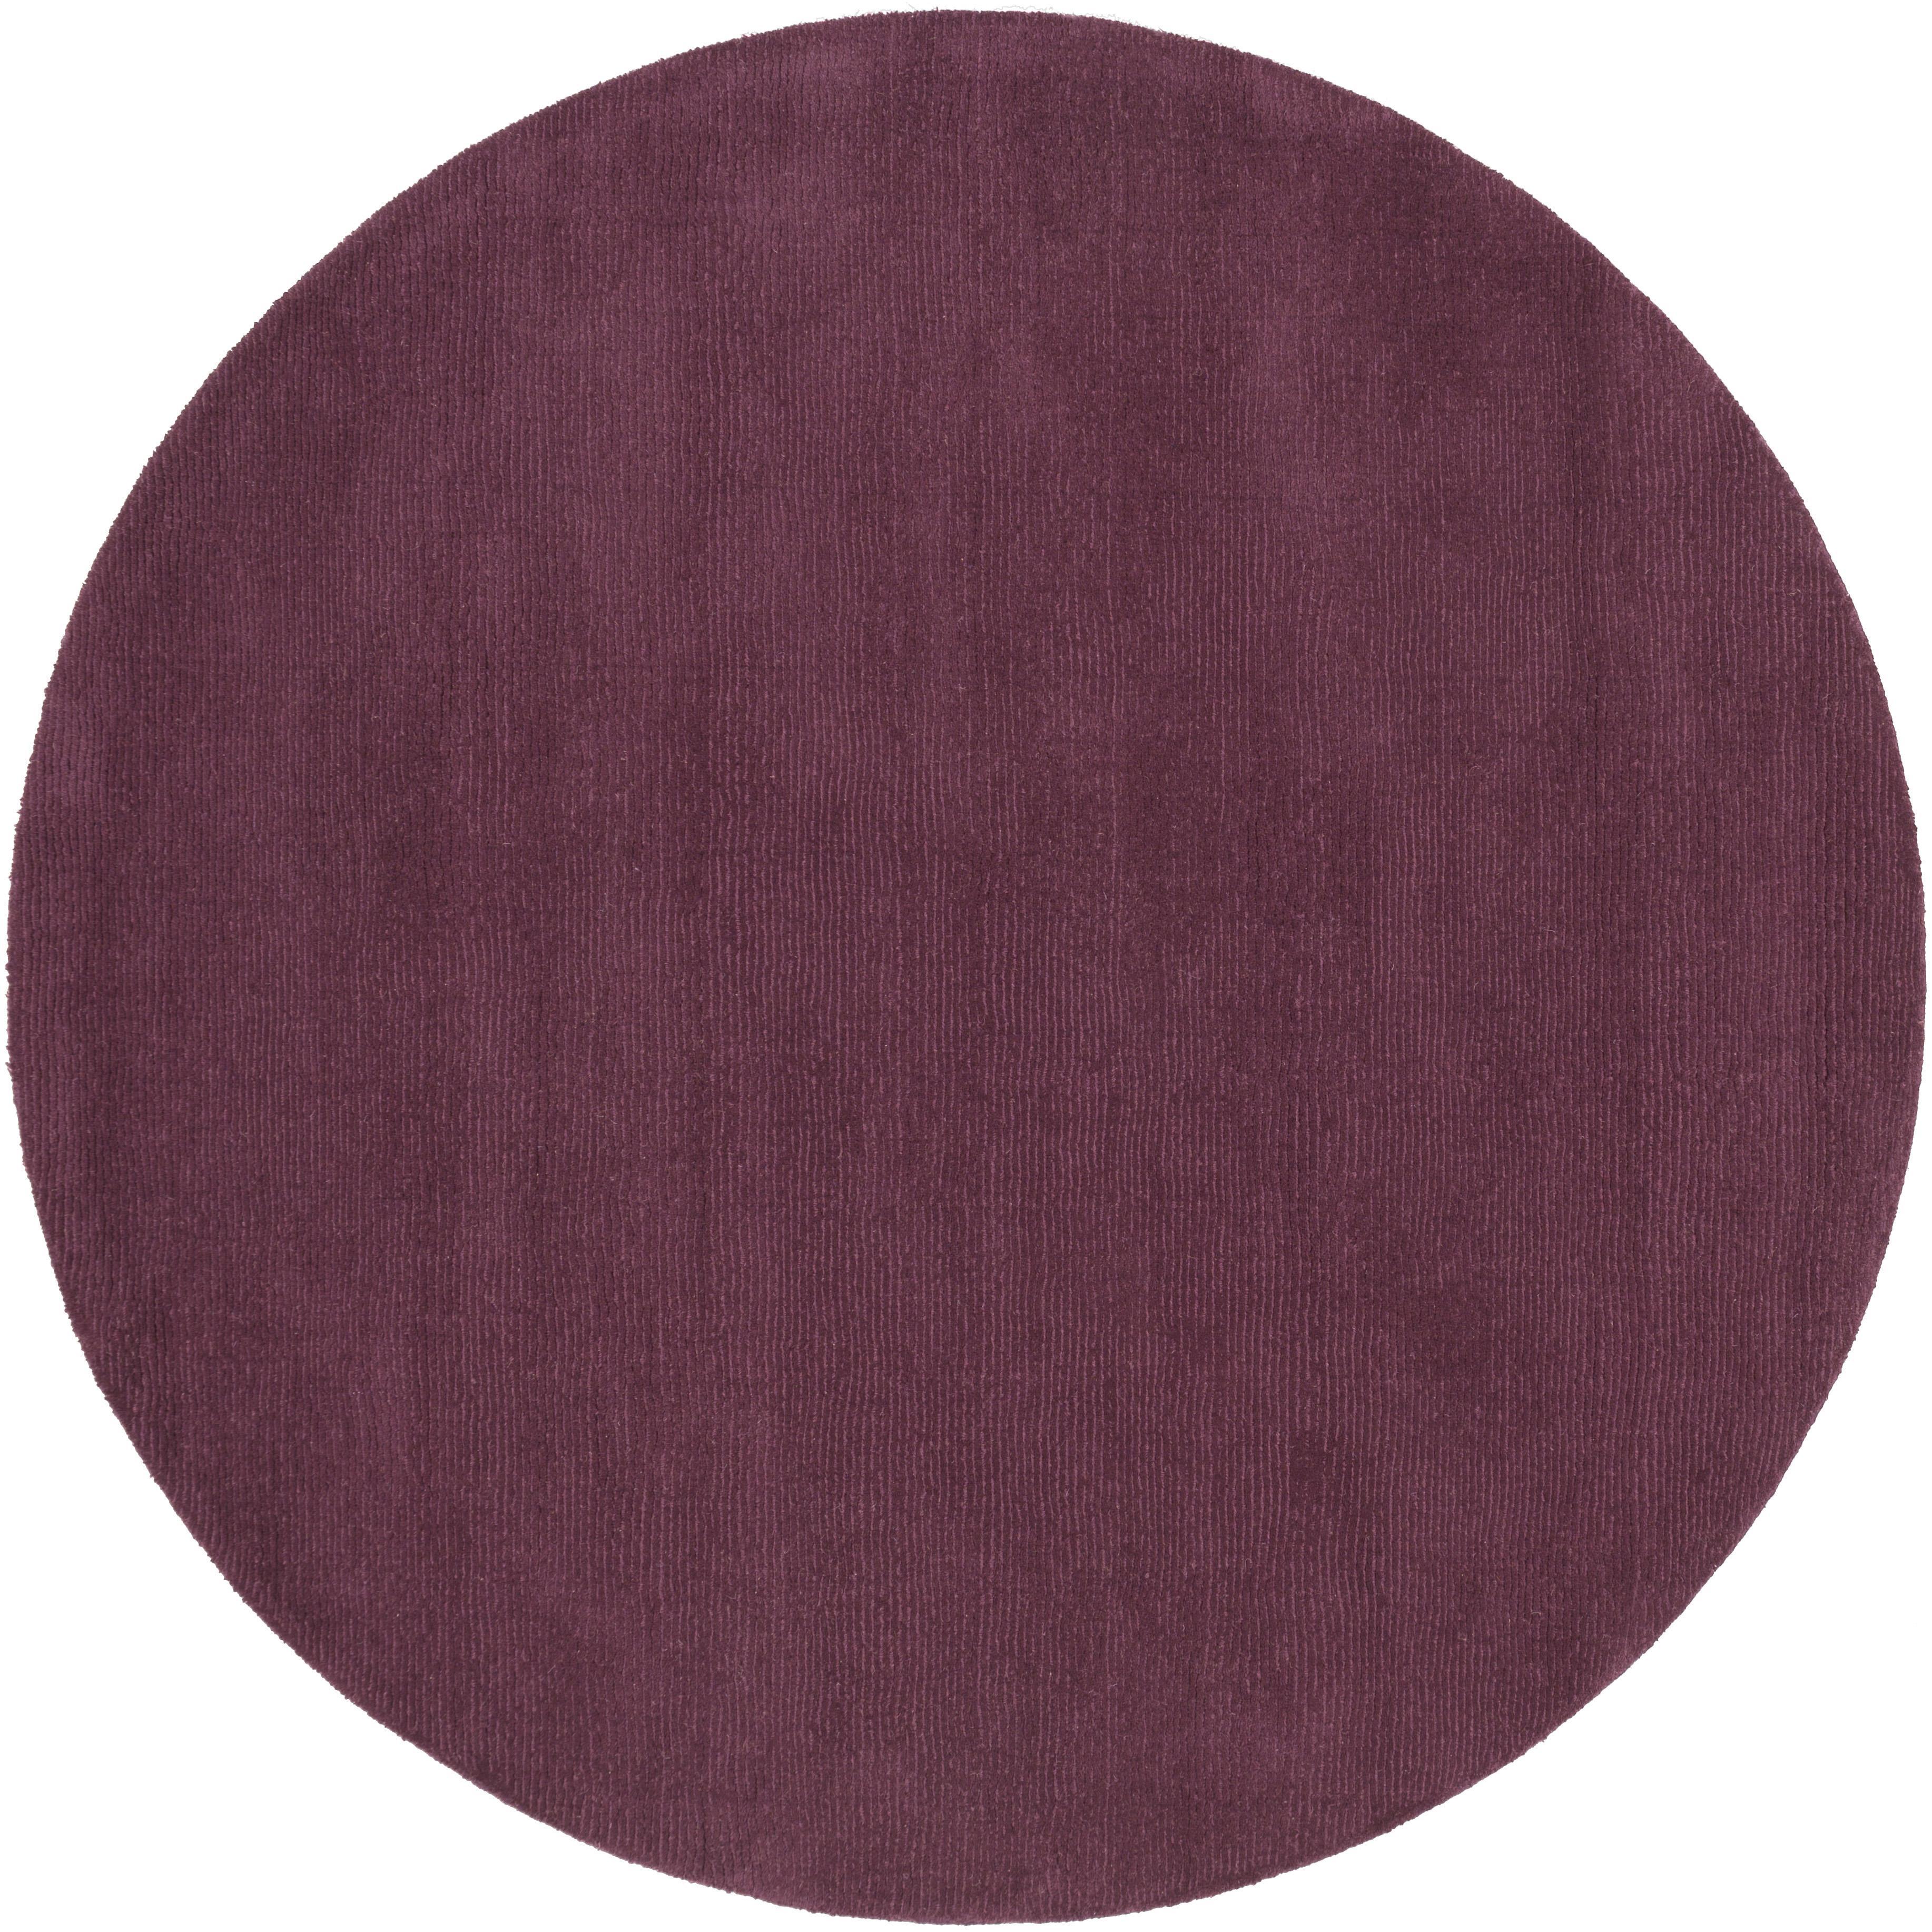 Surya Rugs Mystique 6' Round - Item Number: M5326-6RD